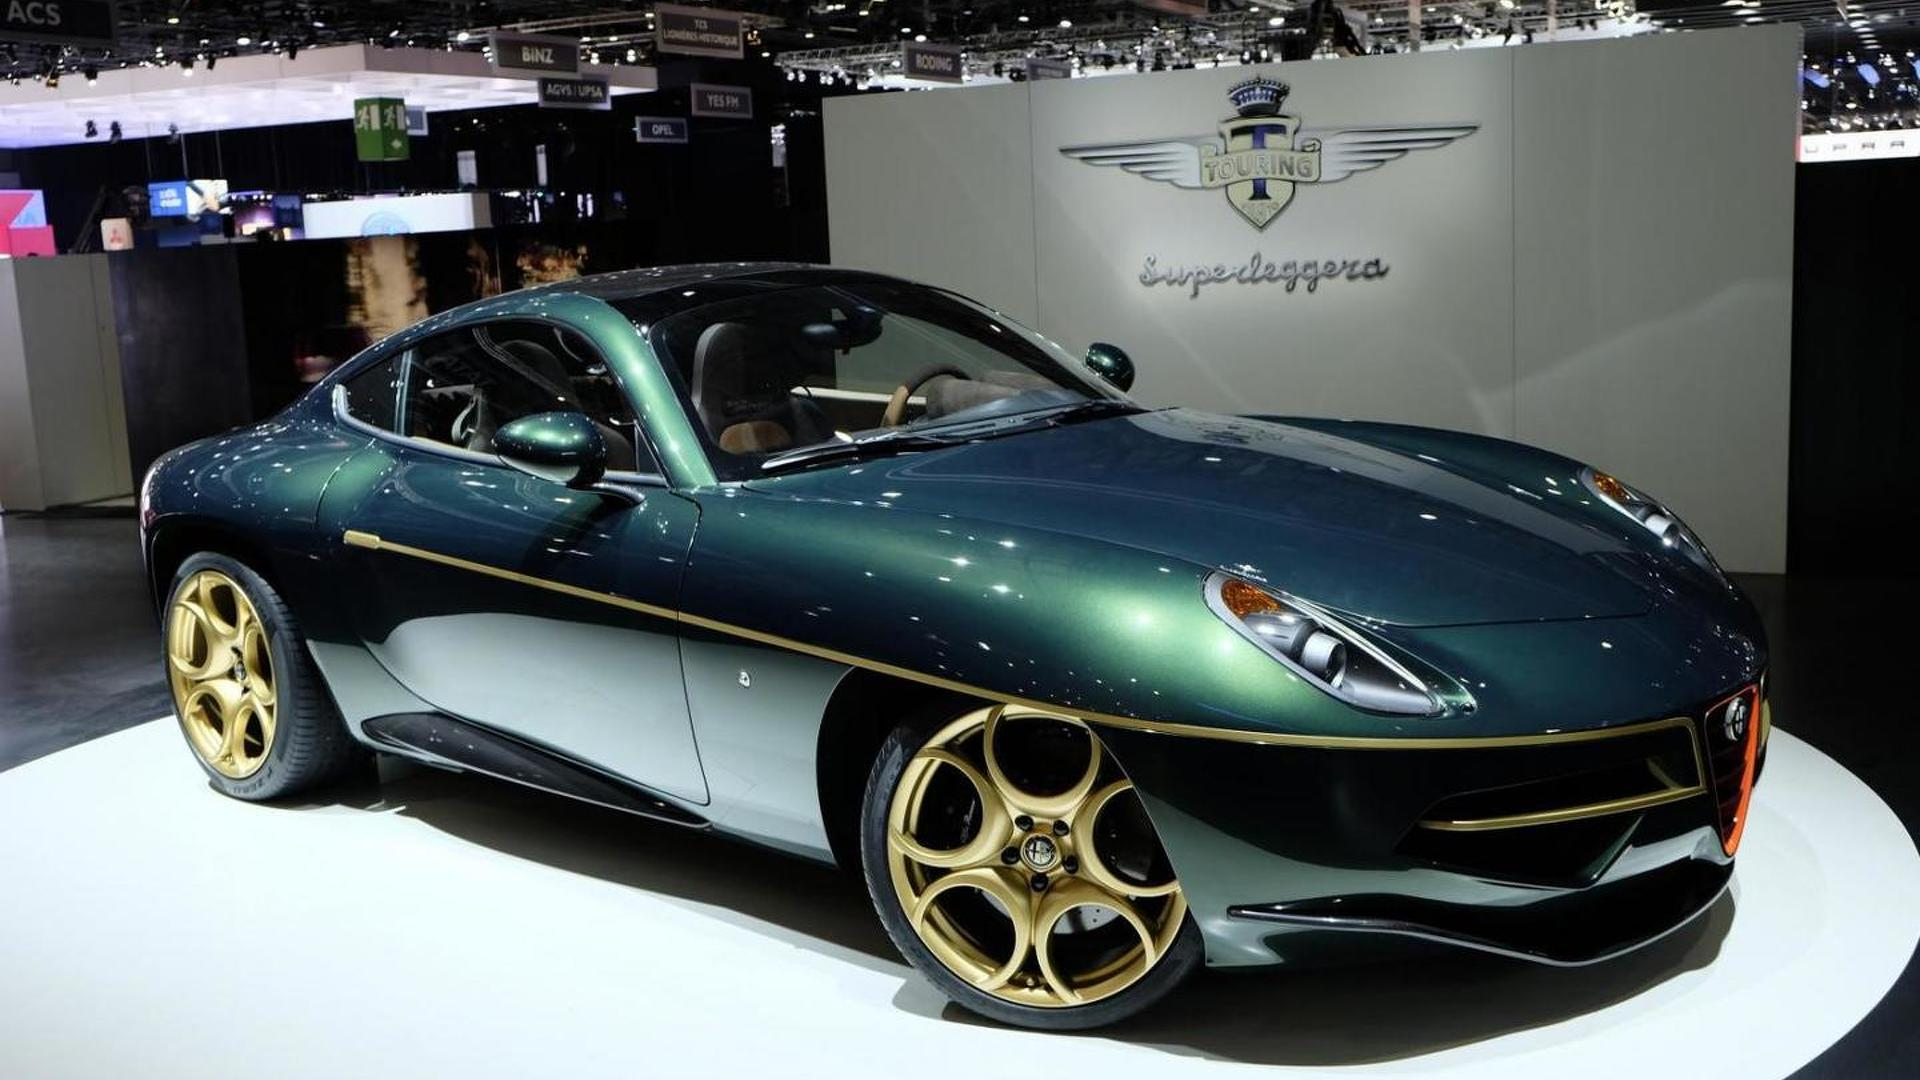 Alfa Romeo Disco Volante For Sale >> Touring Superleggera Delivering Alfa Romeo Disco Volante In